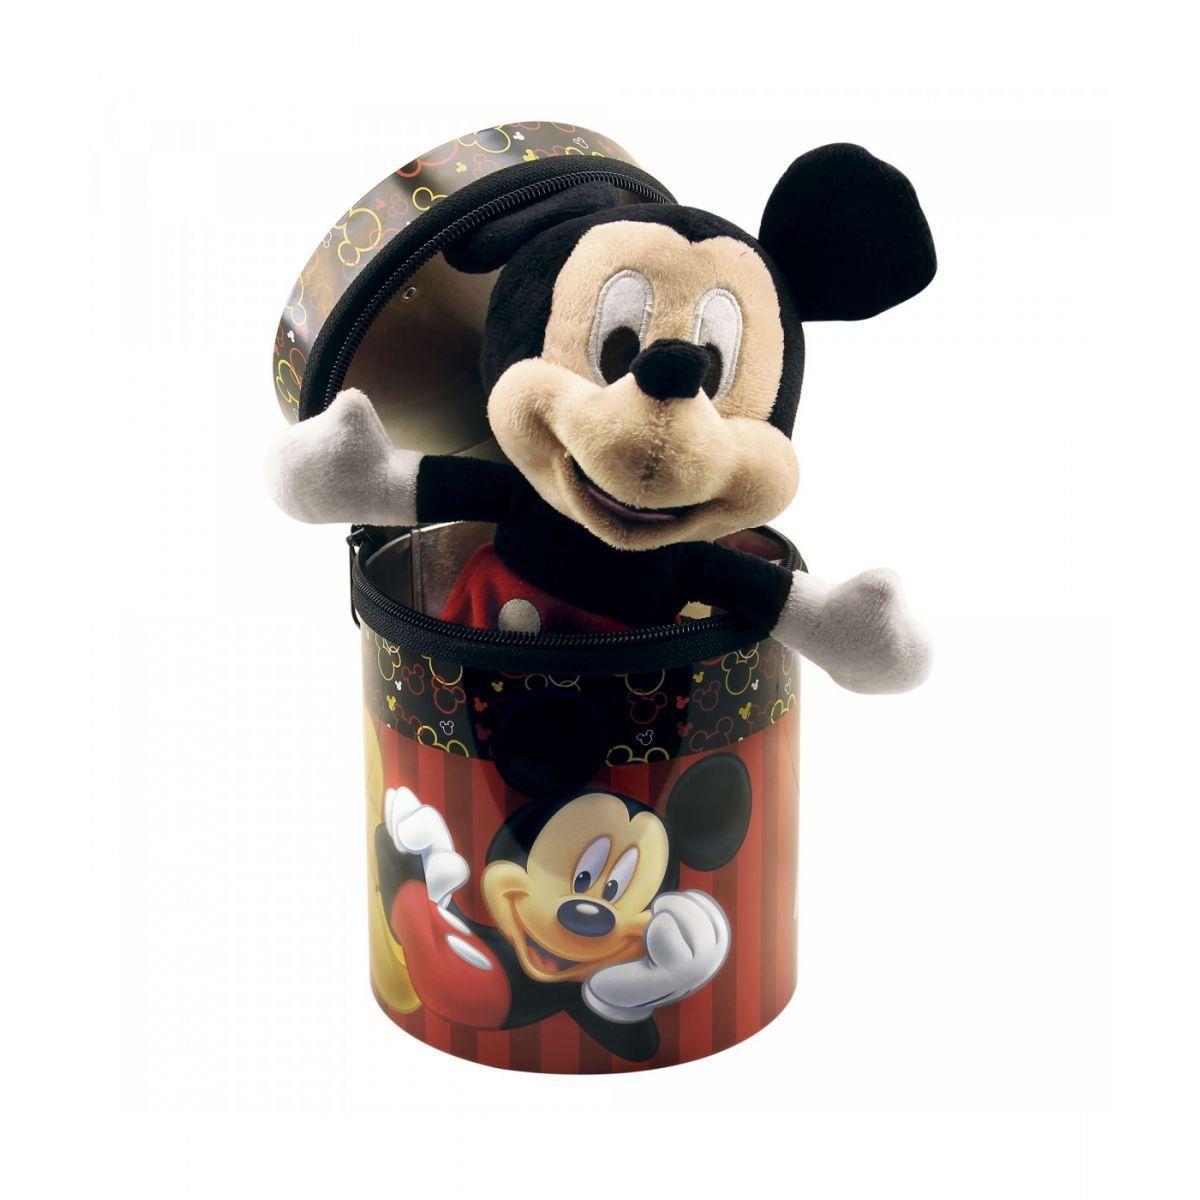 Chaveiro Boneco Mickey Mouse na Lata - Disney